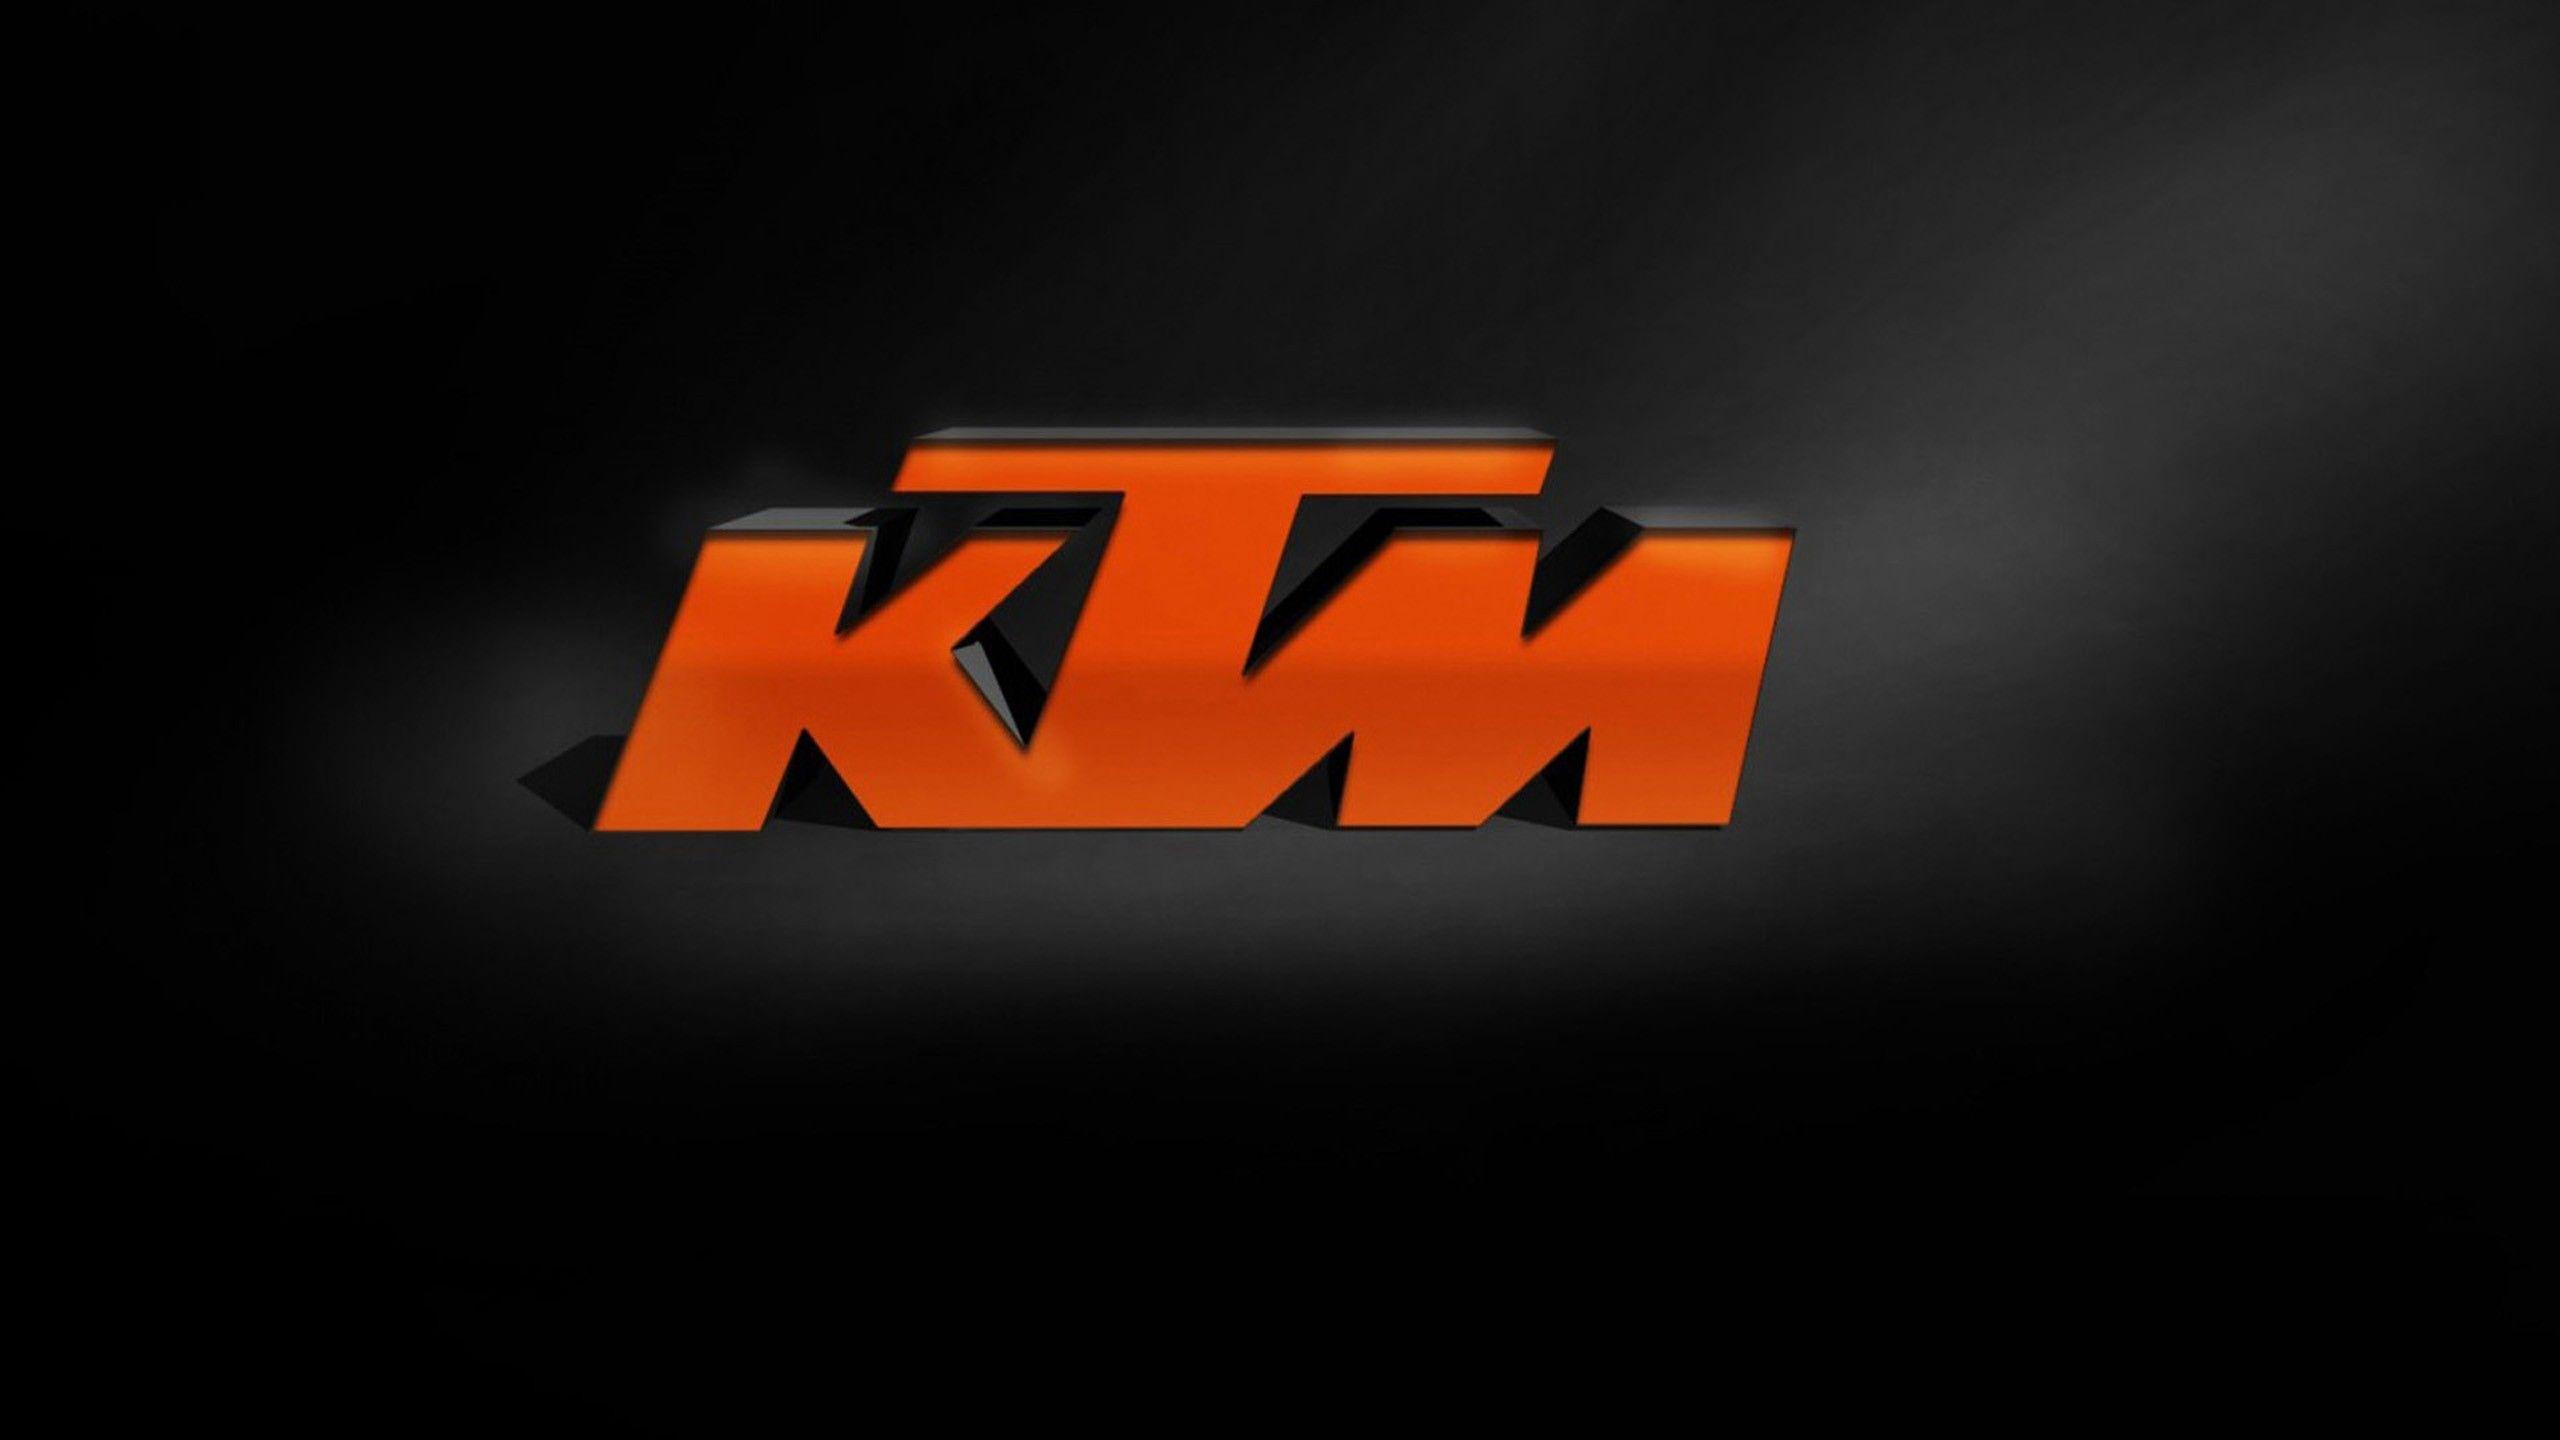 Fresh Ktm Logo Hd Wallpaper Logo Wallpaper Hd Ktm Logos